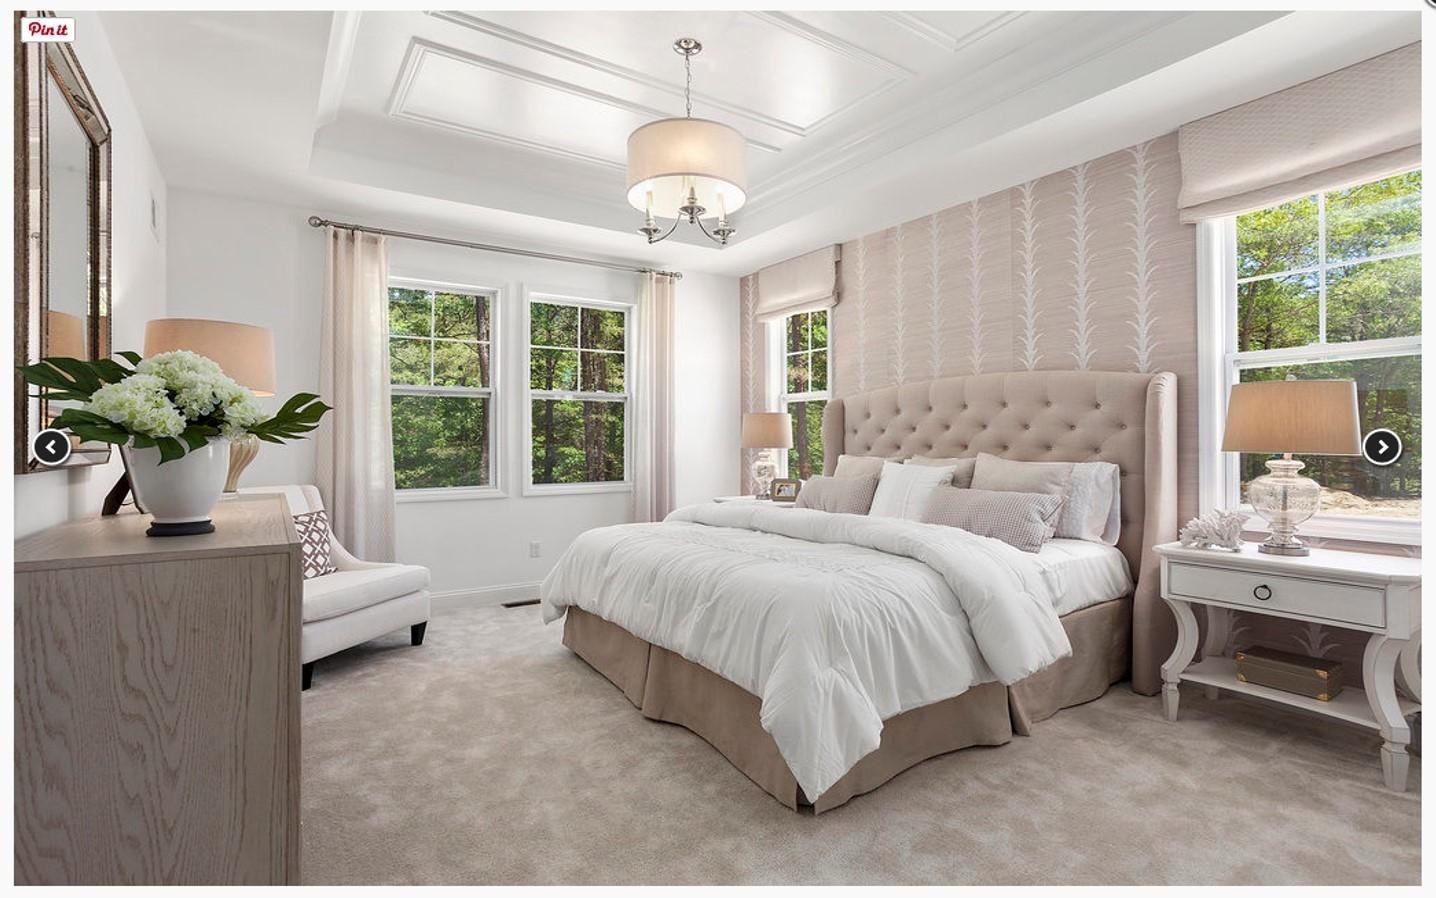 model home merchandising lita dirks co interior design and